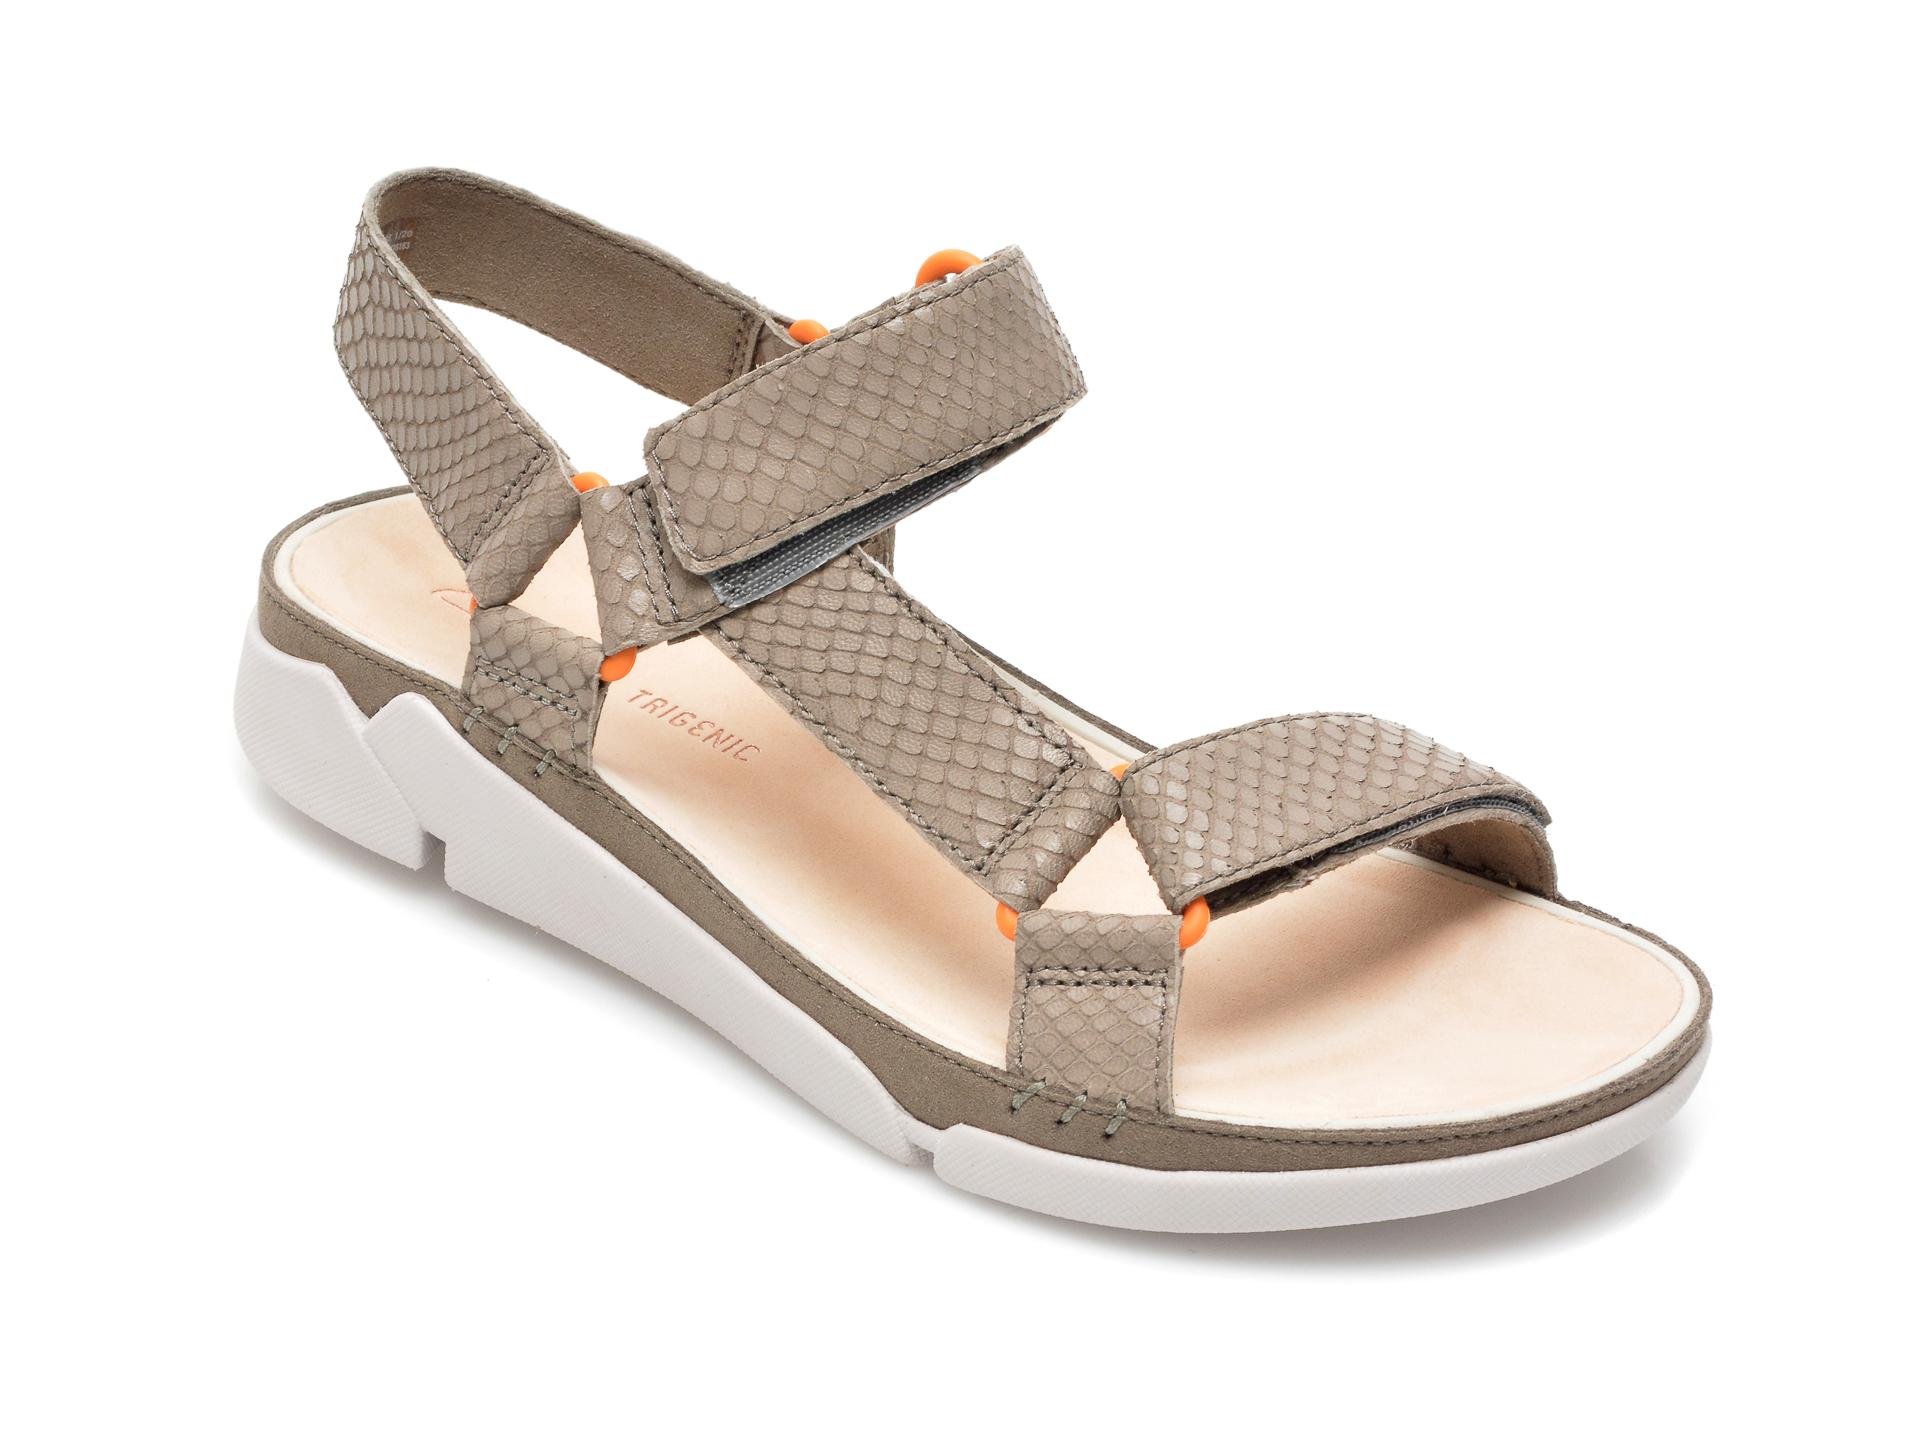 Sandale CLARKS gri, Tri Sporty, din piele naturala imagine otter.ro 2021